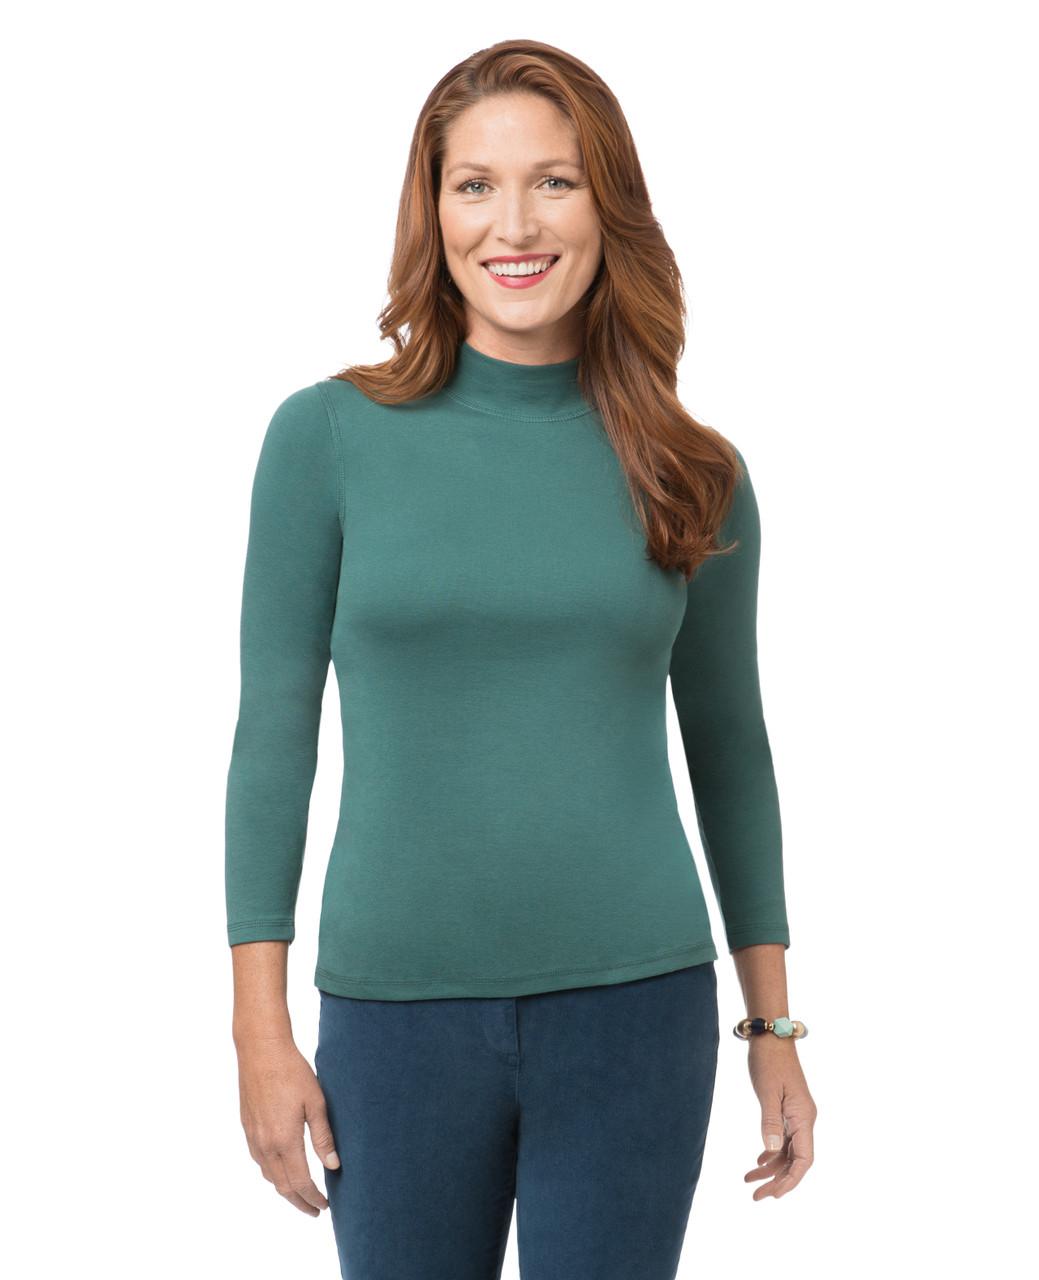 684076f14ab1 Solid Long Sleeve Mock Neck Shirt